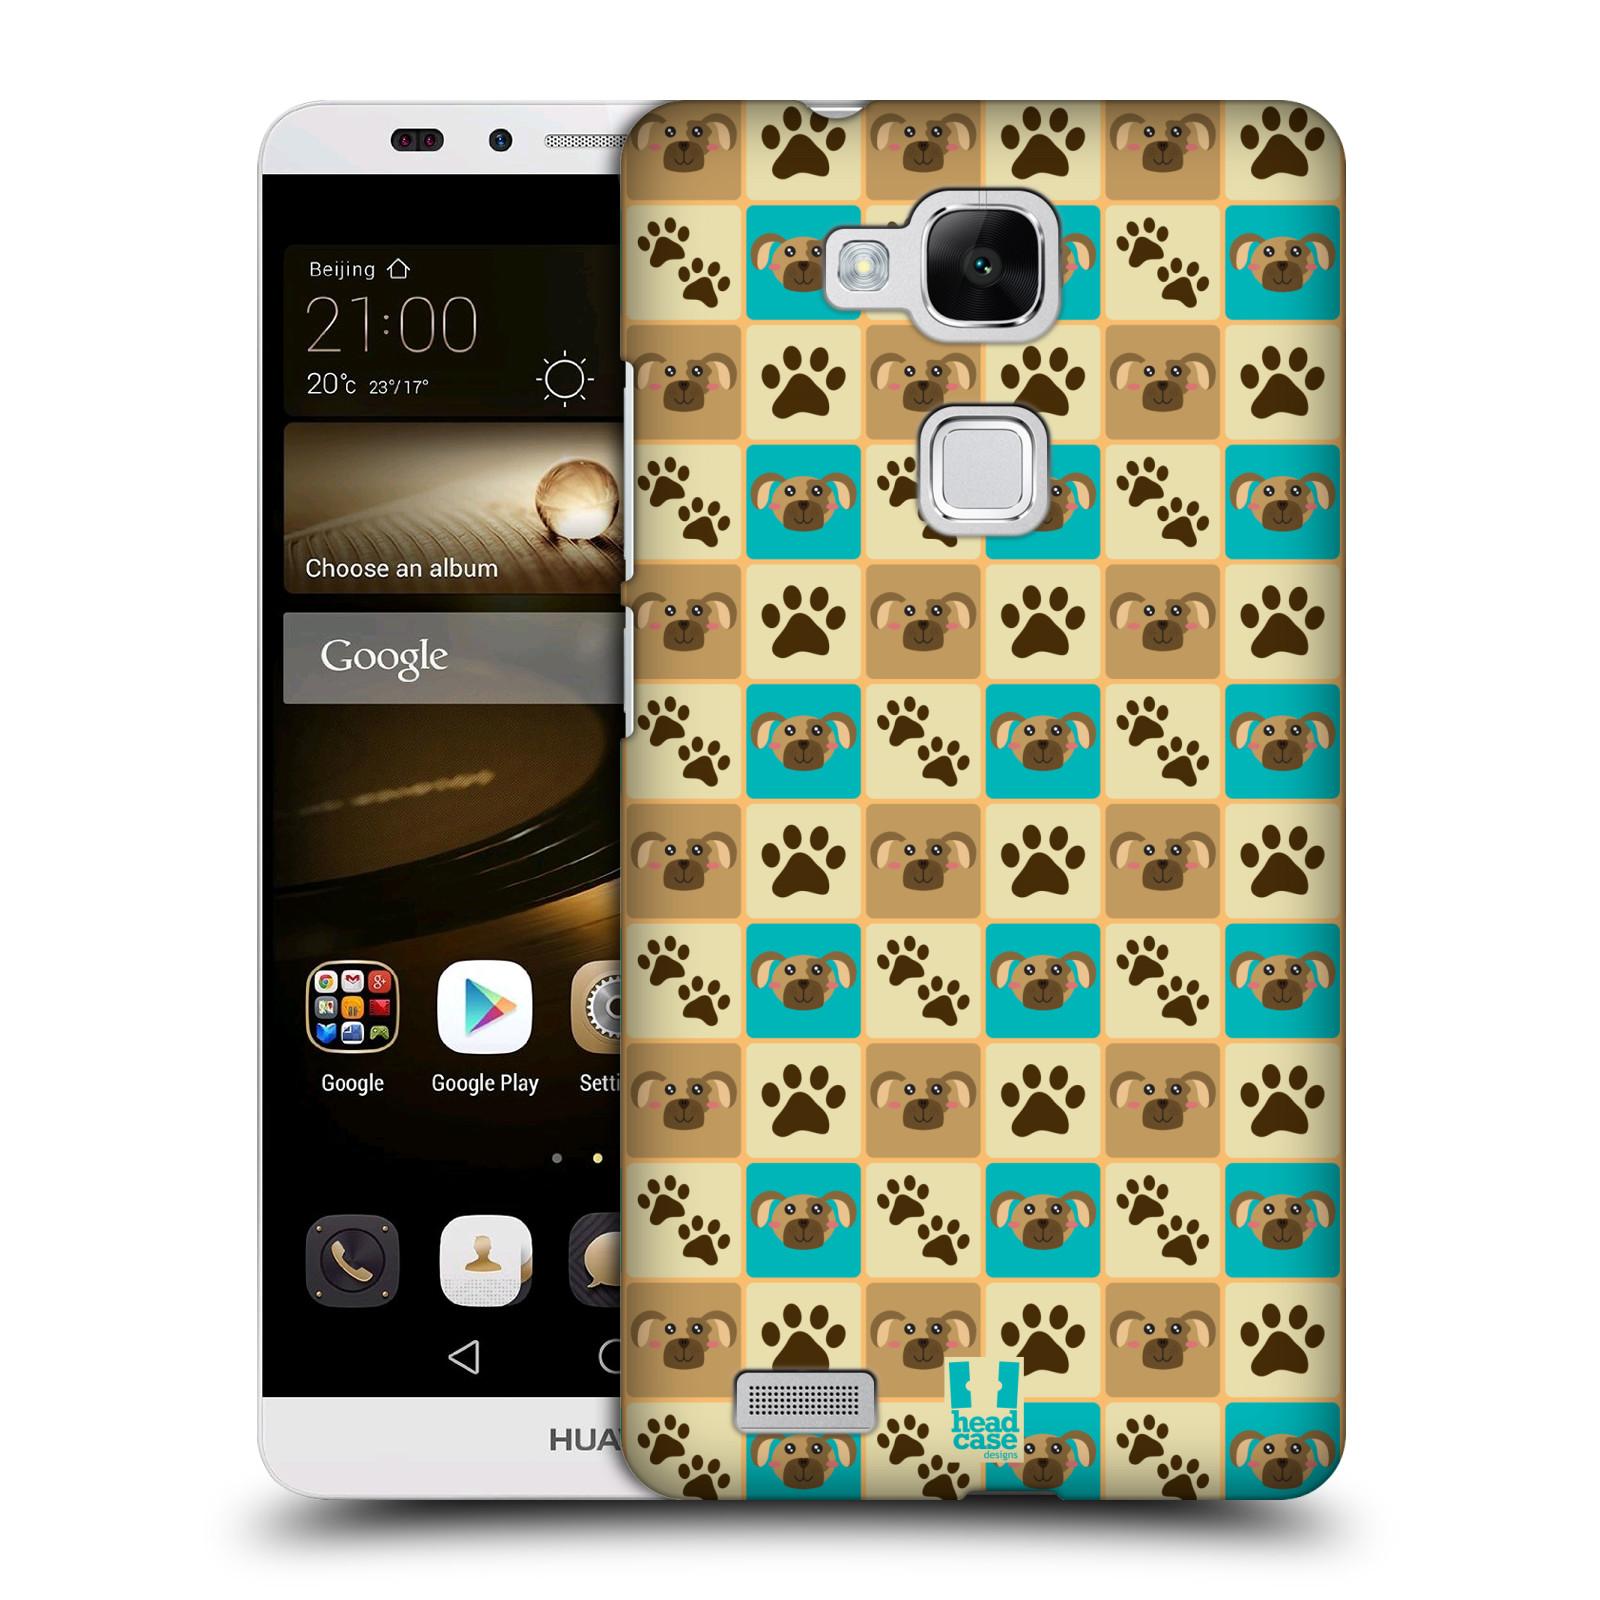 HEAD CASE plastový obal na mobil Huawei Mate 7 vzor Zvířecí razítka PSÍ TLAPKA